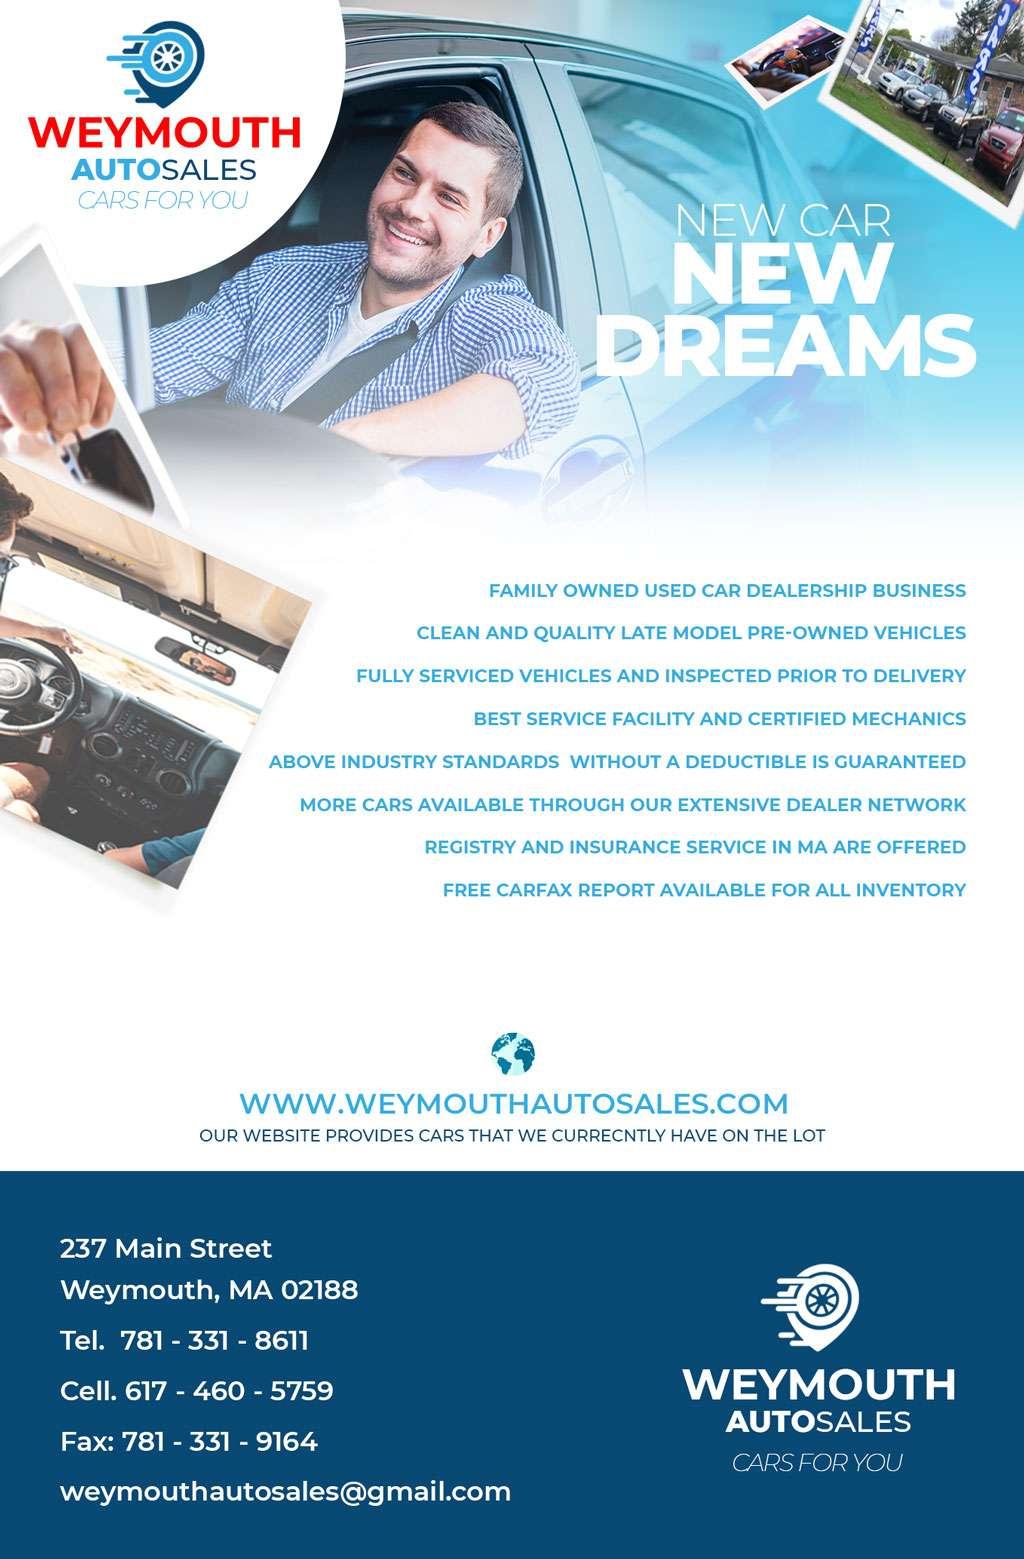 Weymouth Auto Sales